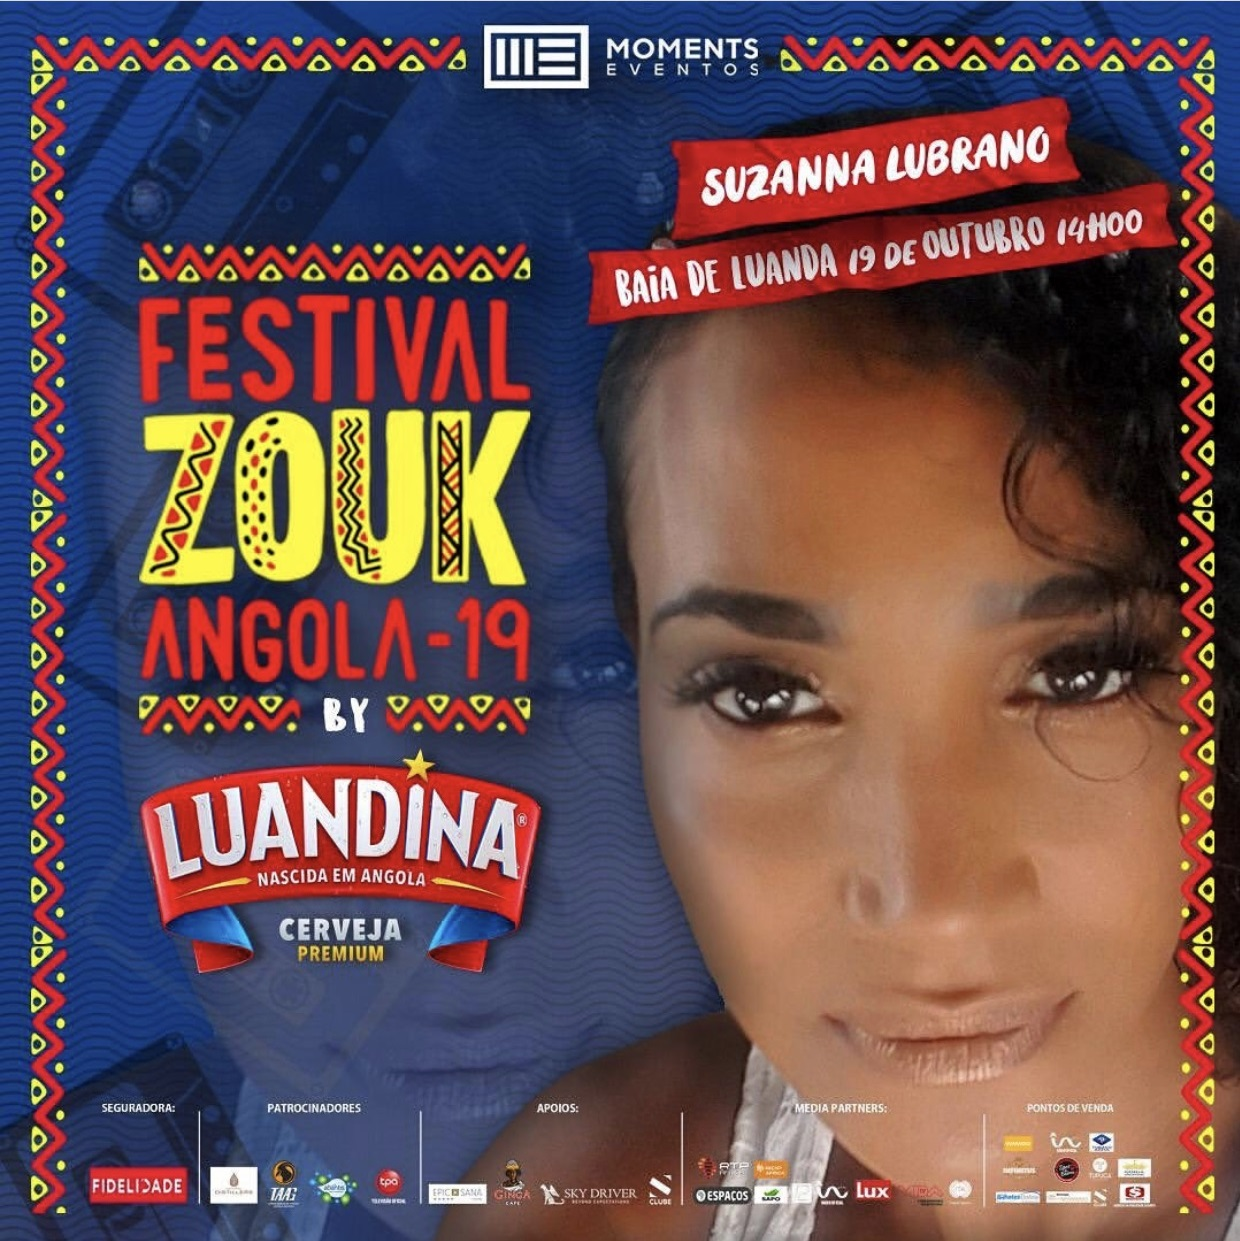 Suzanna Lubrano - 19th October 2019